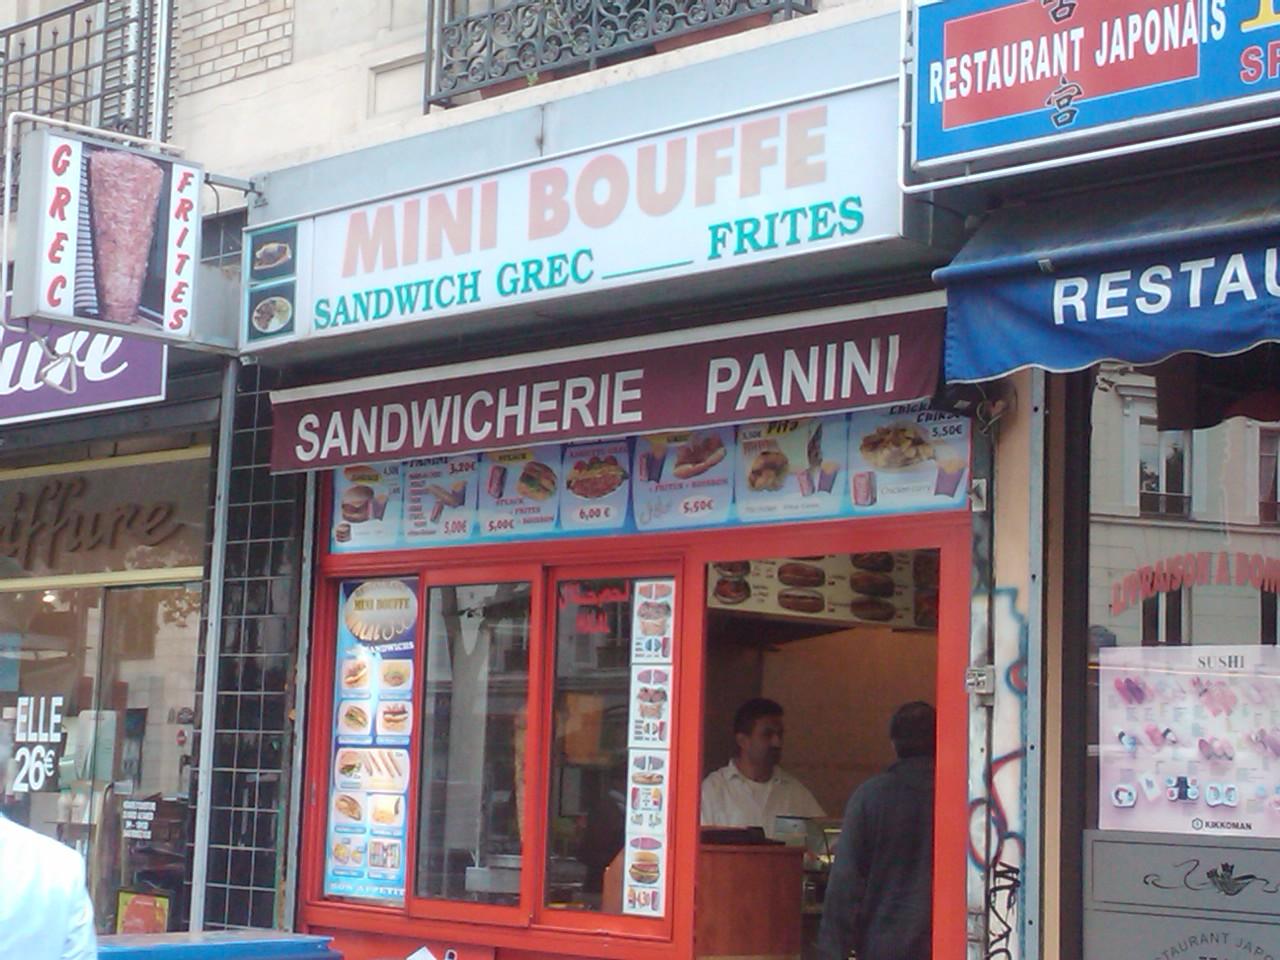 Mini Bouffe